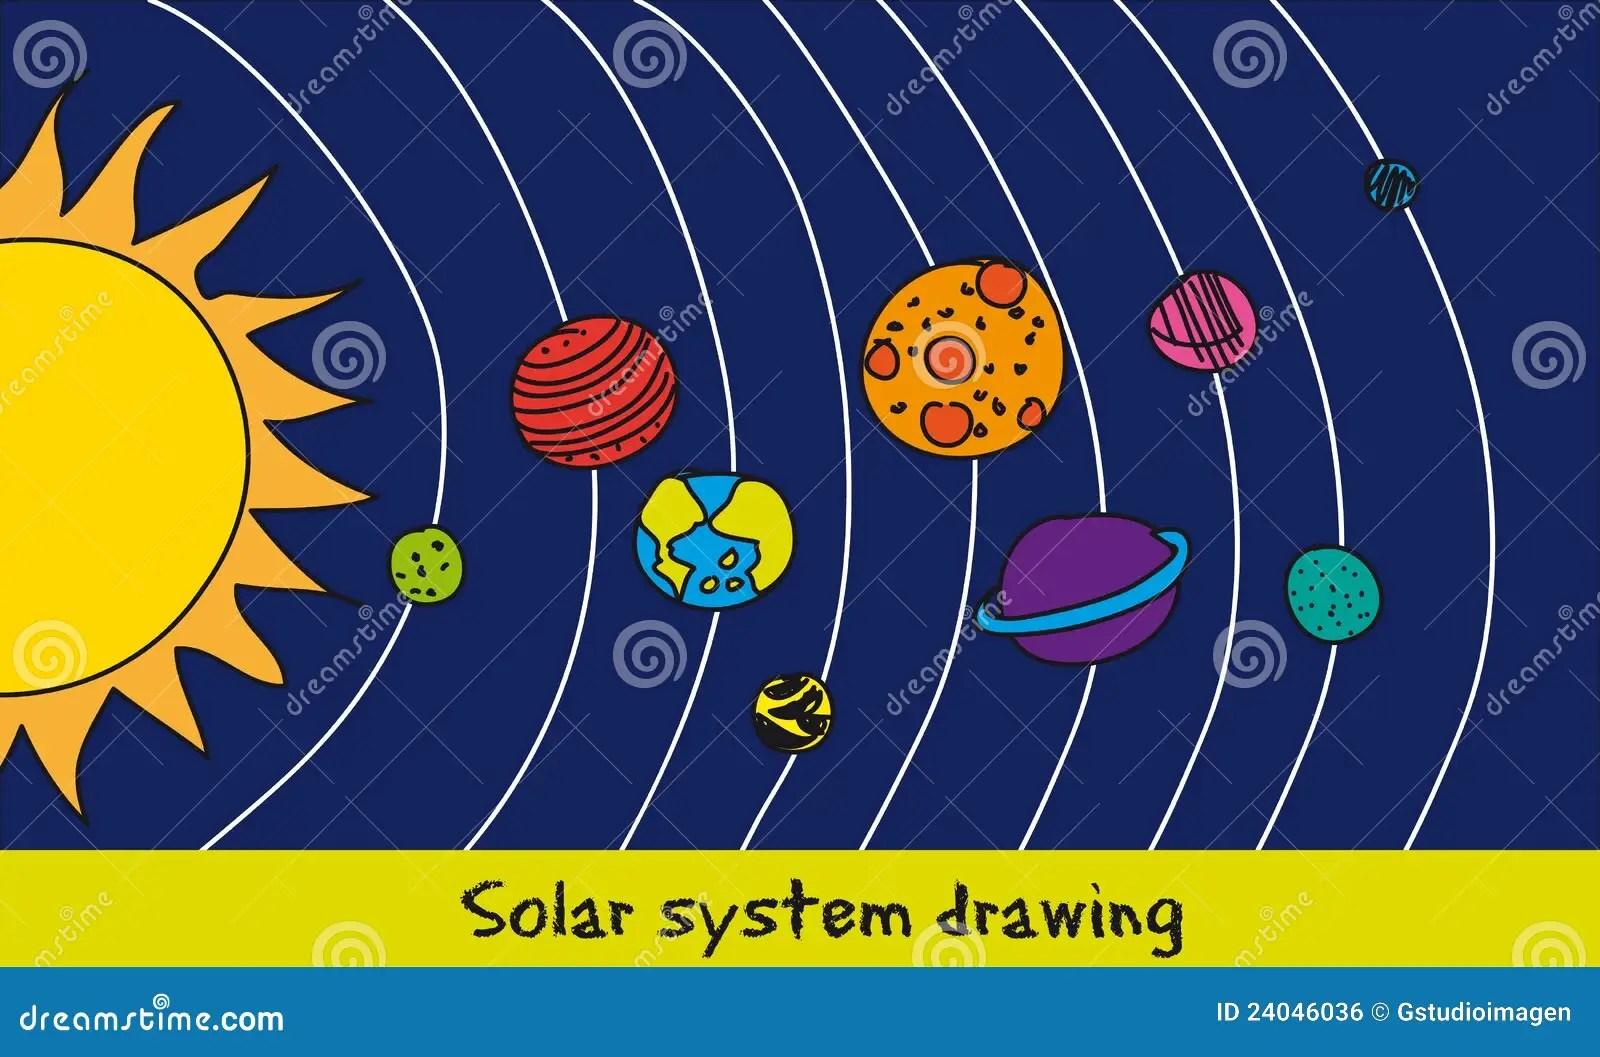 Solar System Drawing Stock Vector Illustration Of